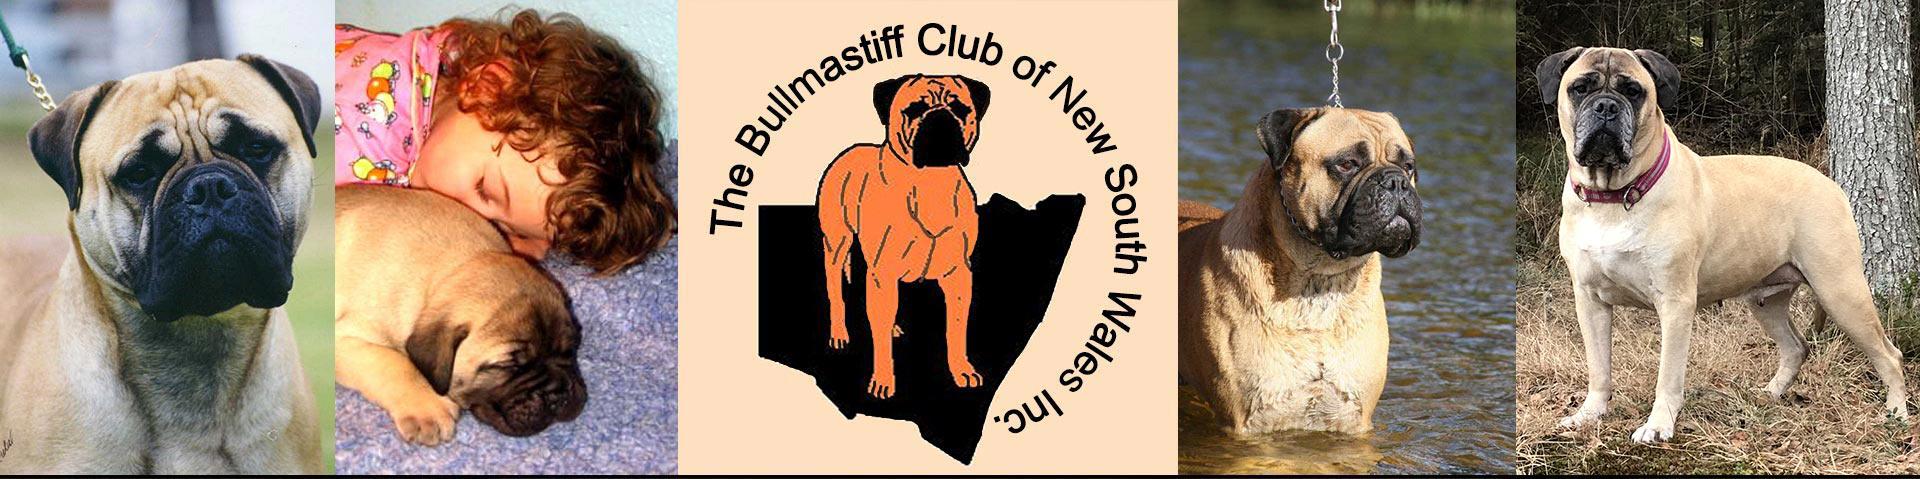 Bullmastiff Club of NSW Inc